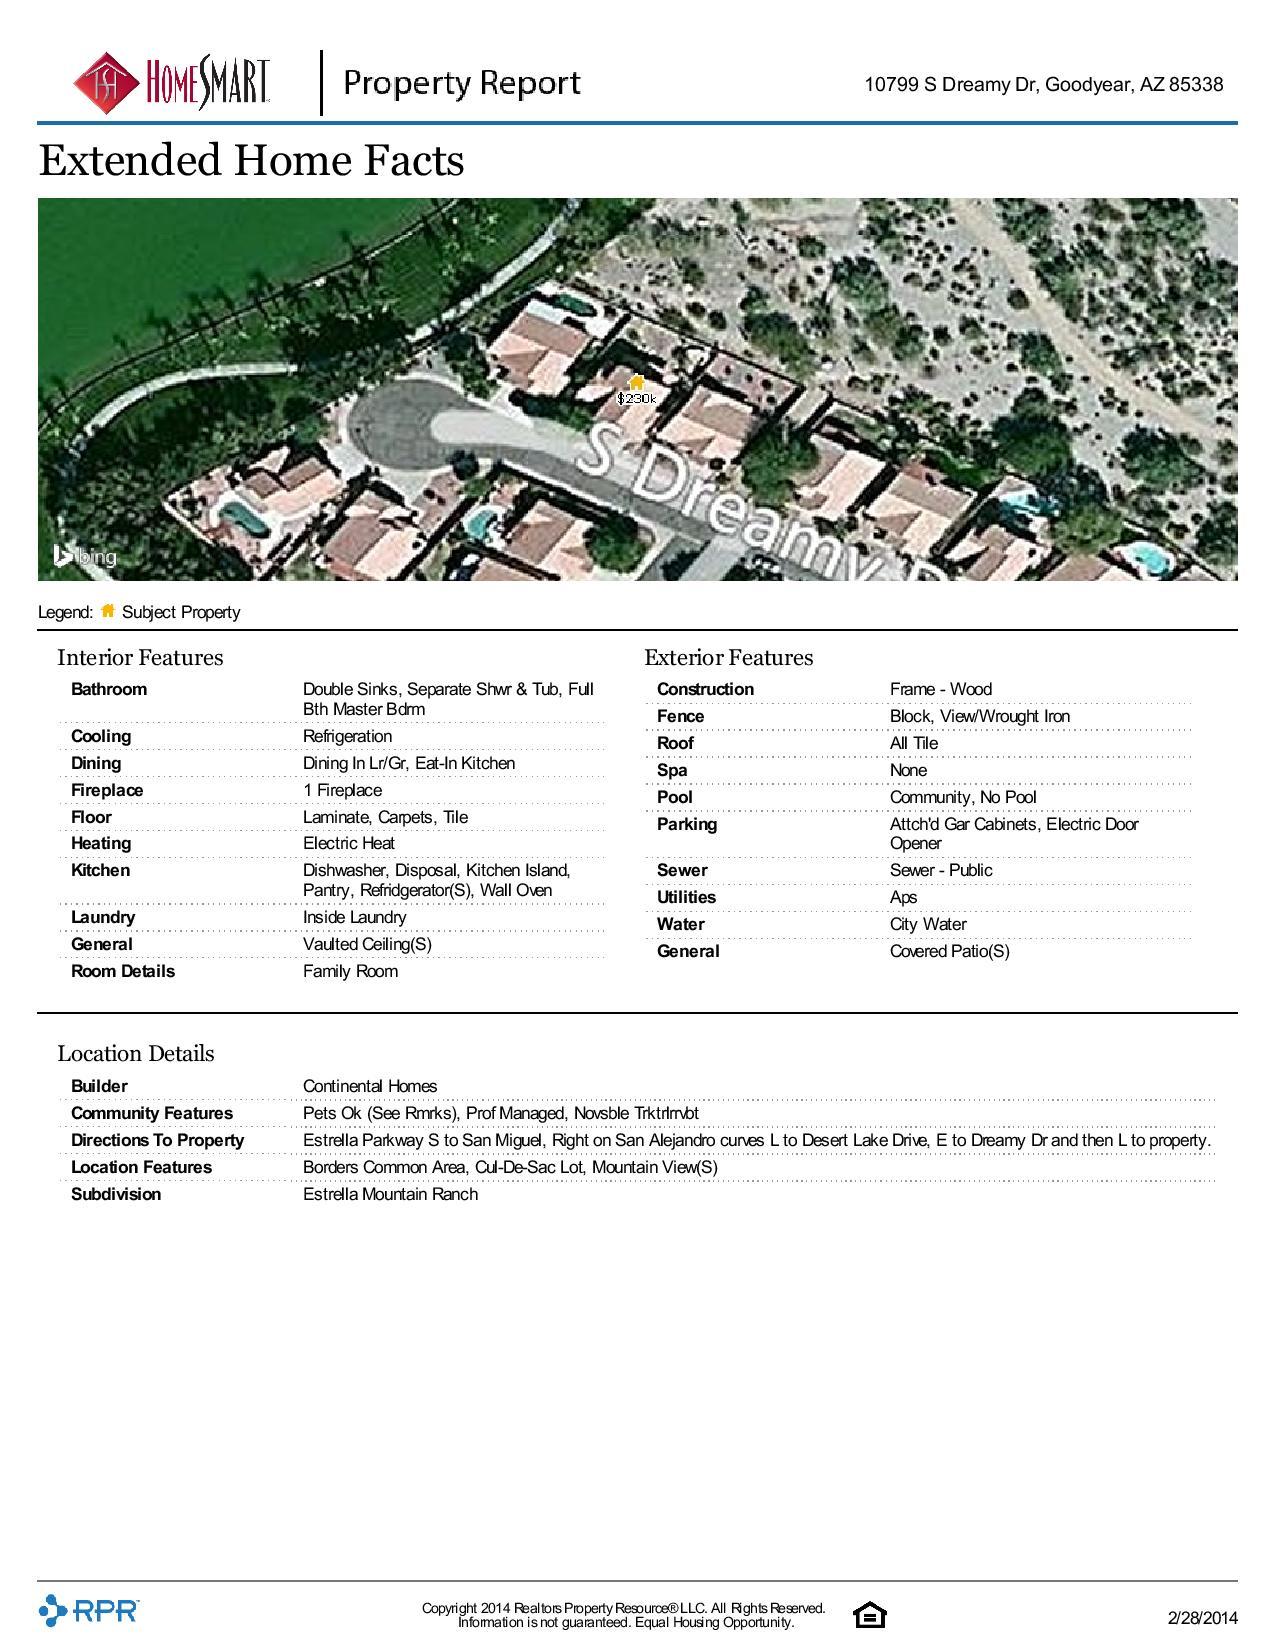 10799-S-Dreamy-Dr-Goodyear-AZ-85338-page-004